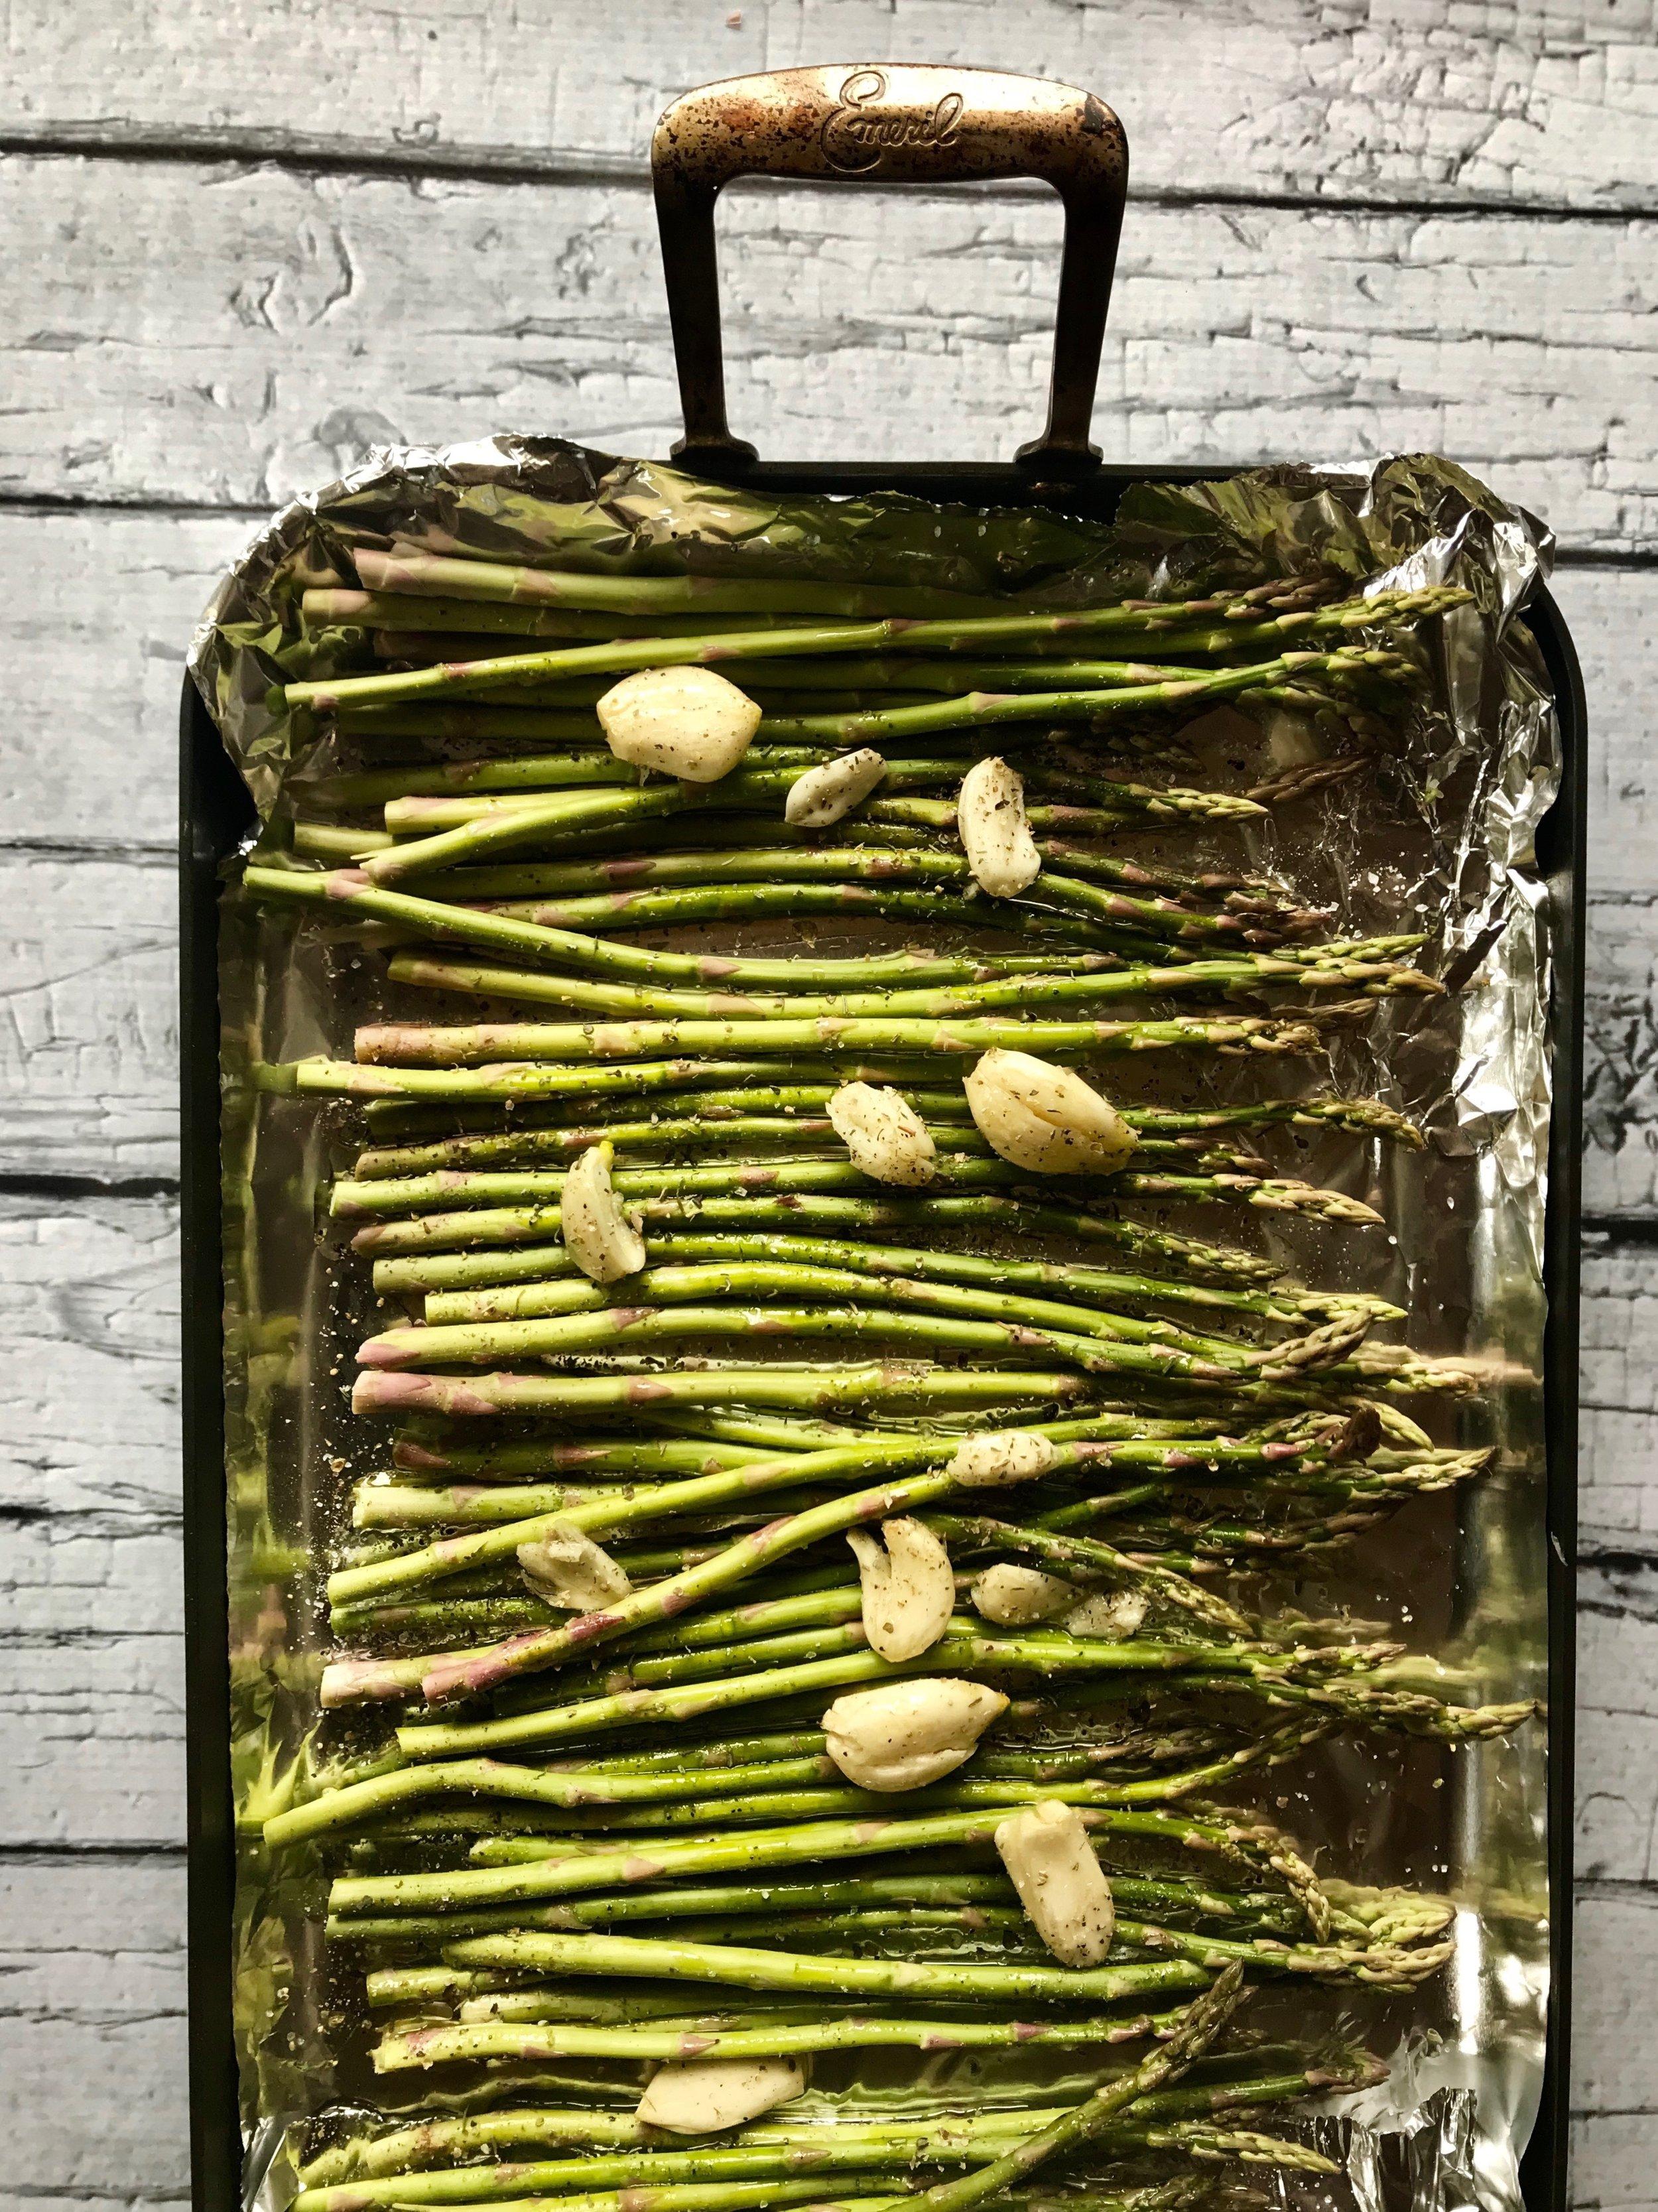 Roasted asparagus and garlic